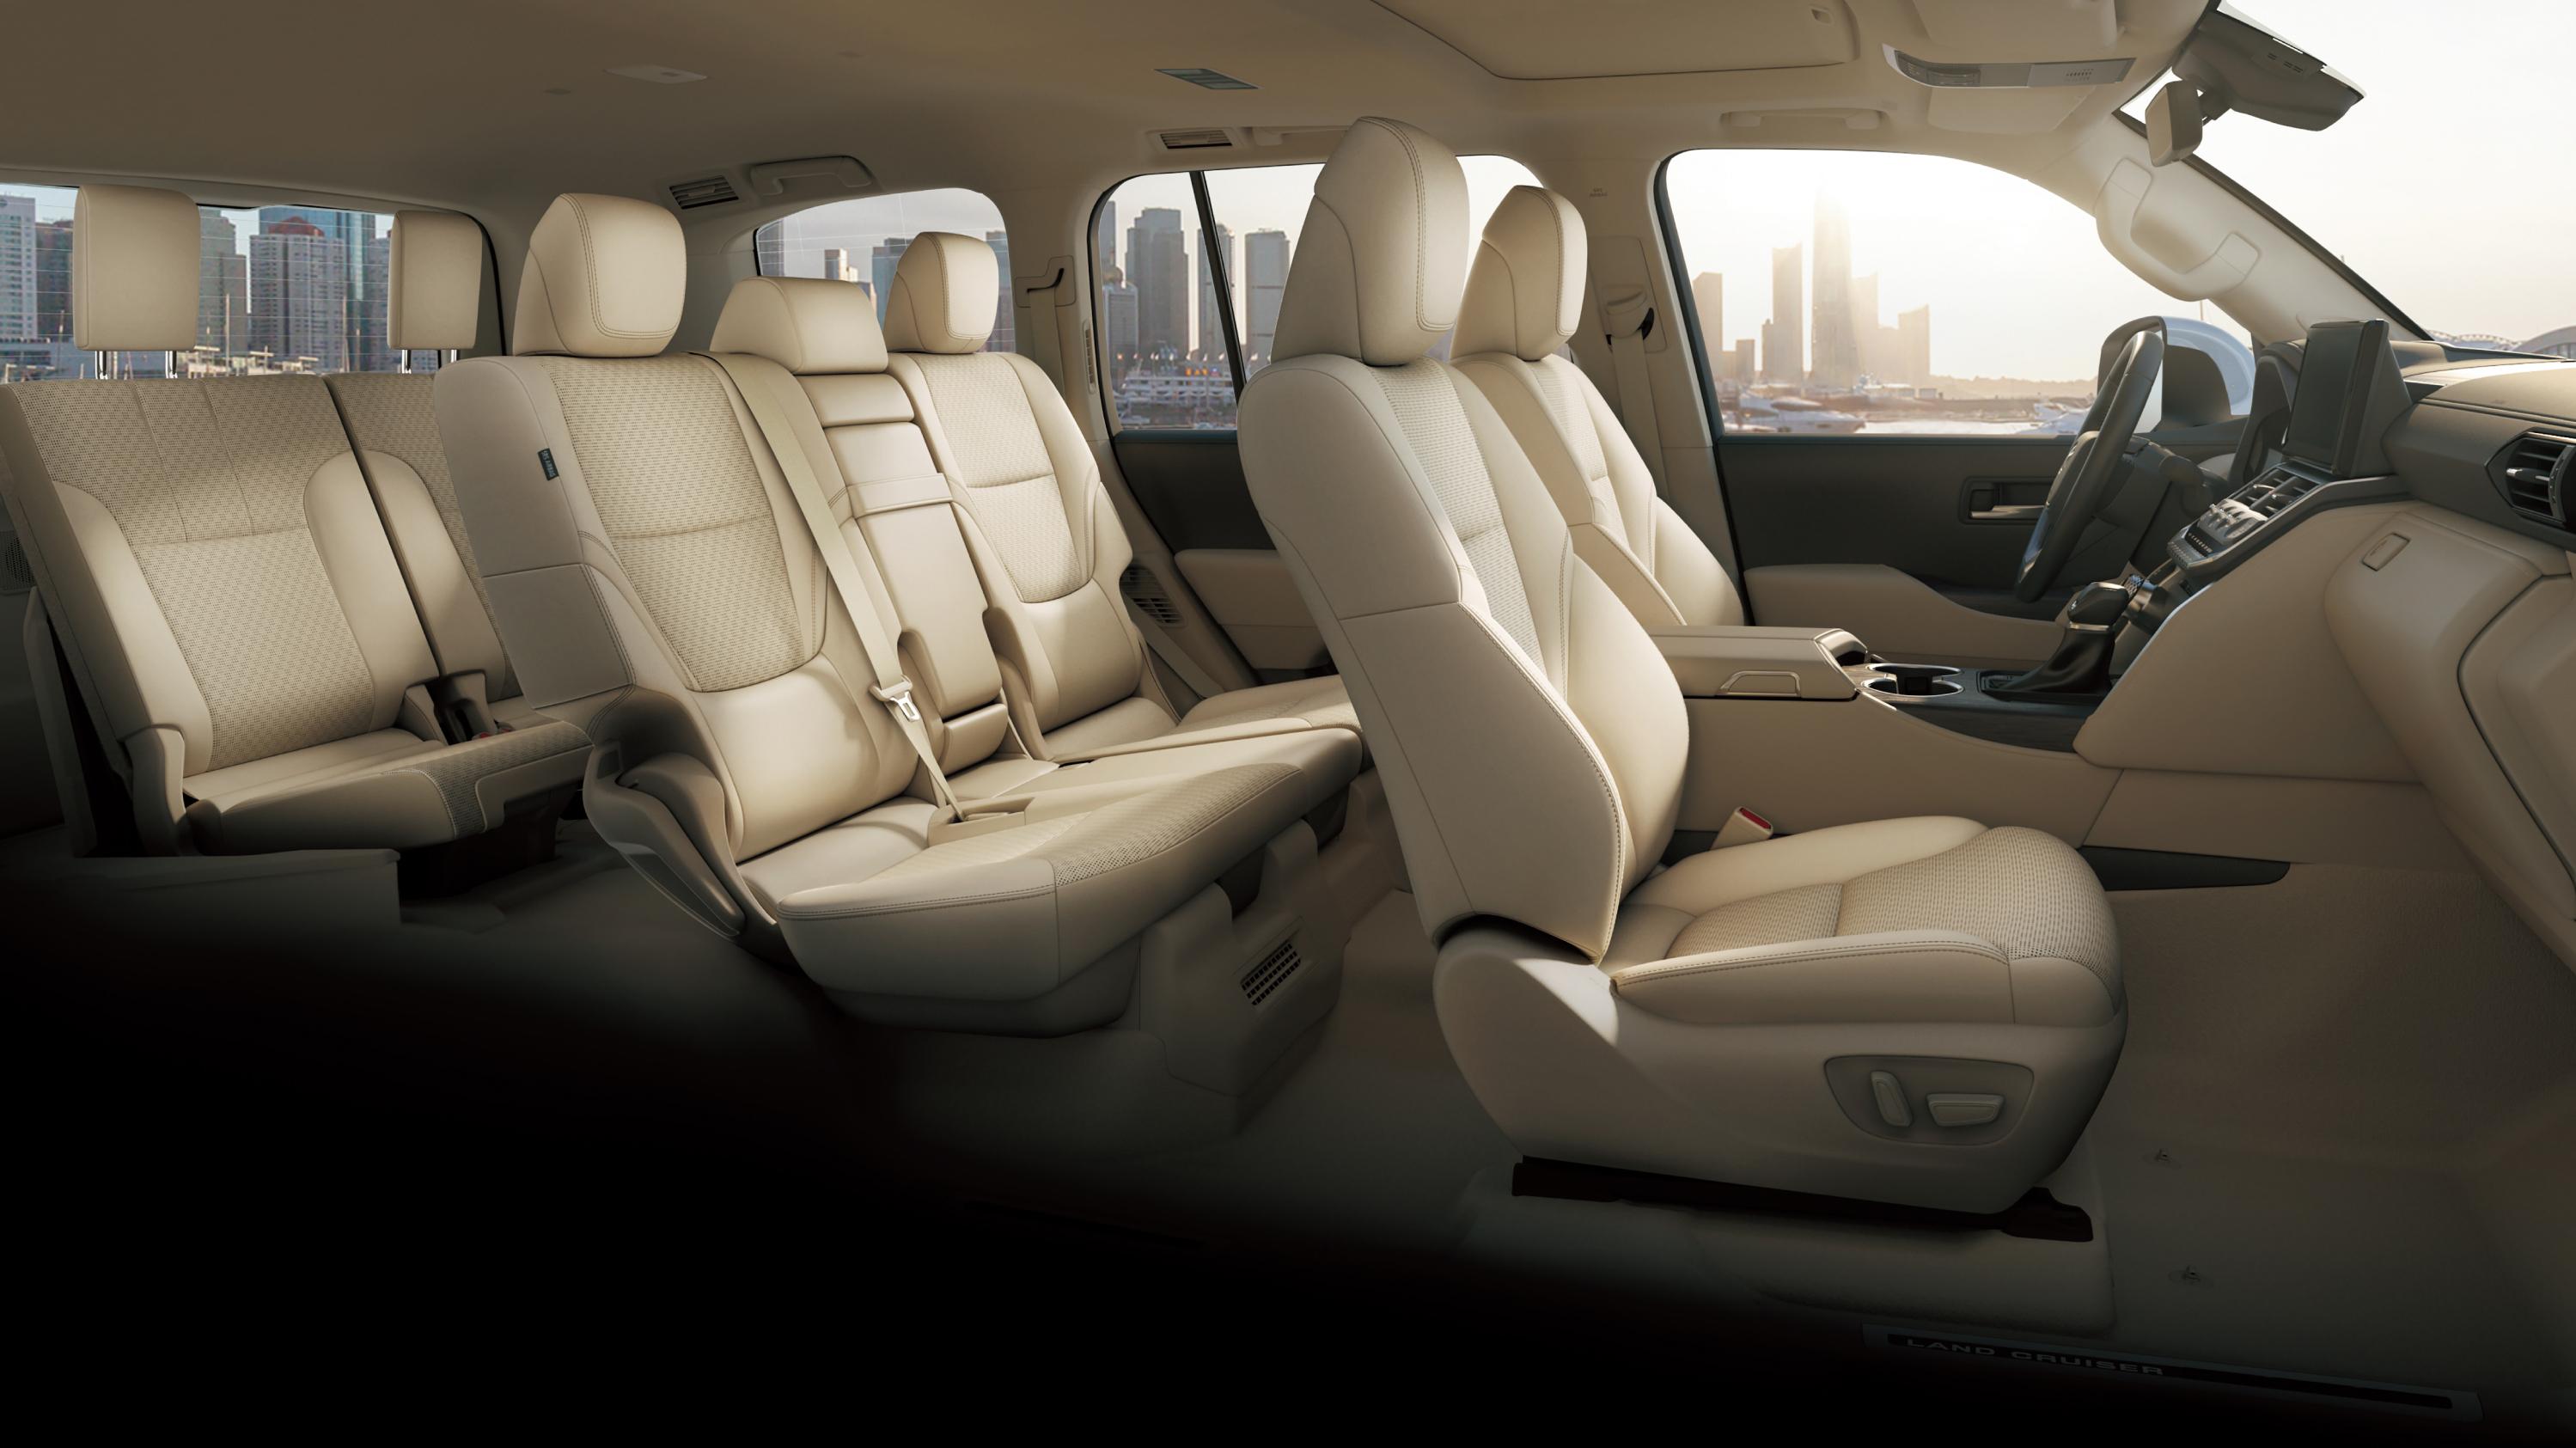 Toyota LandCruiser 300 series interior